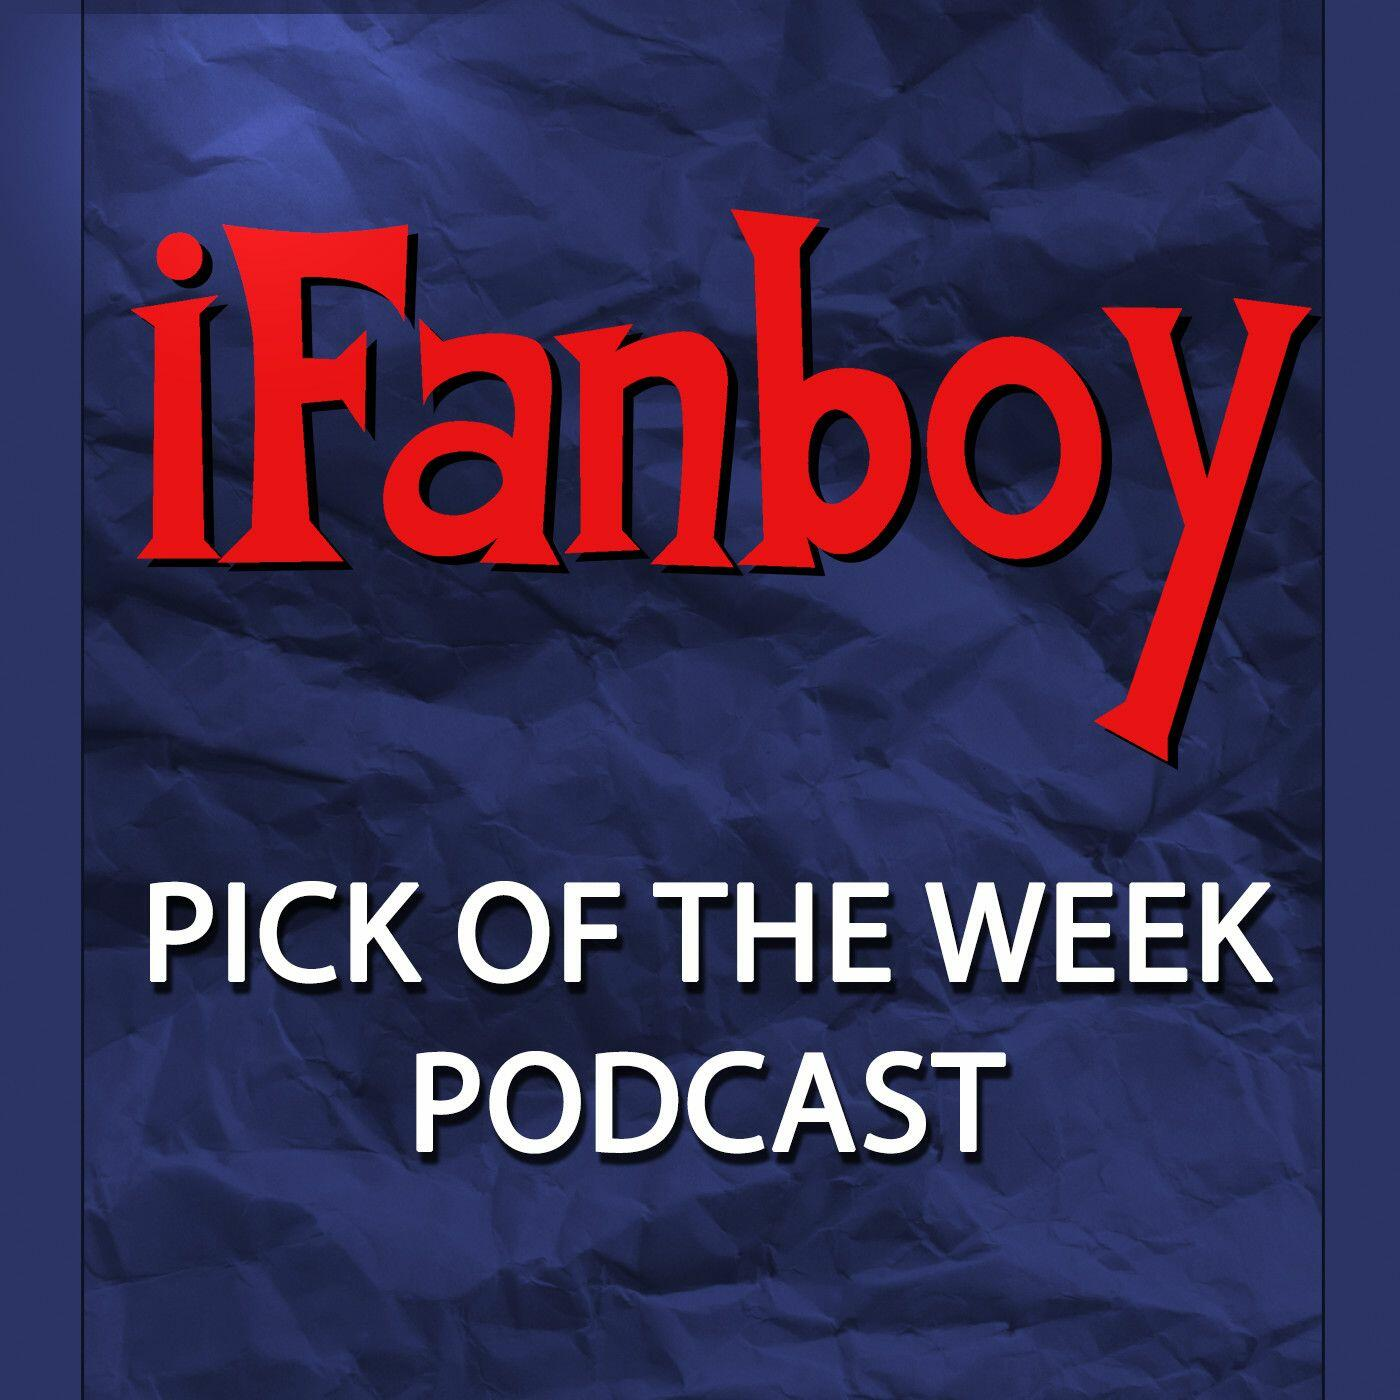 iFanboy - Comic Books